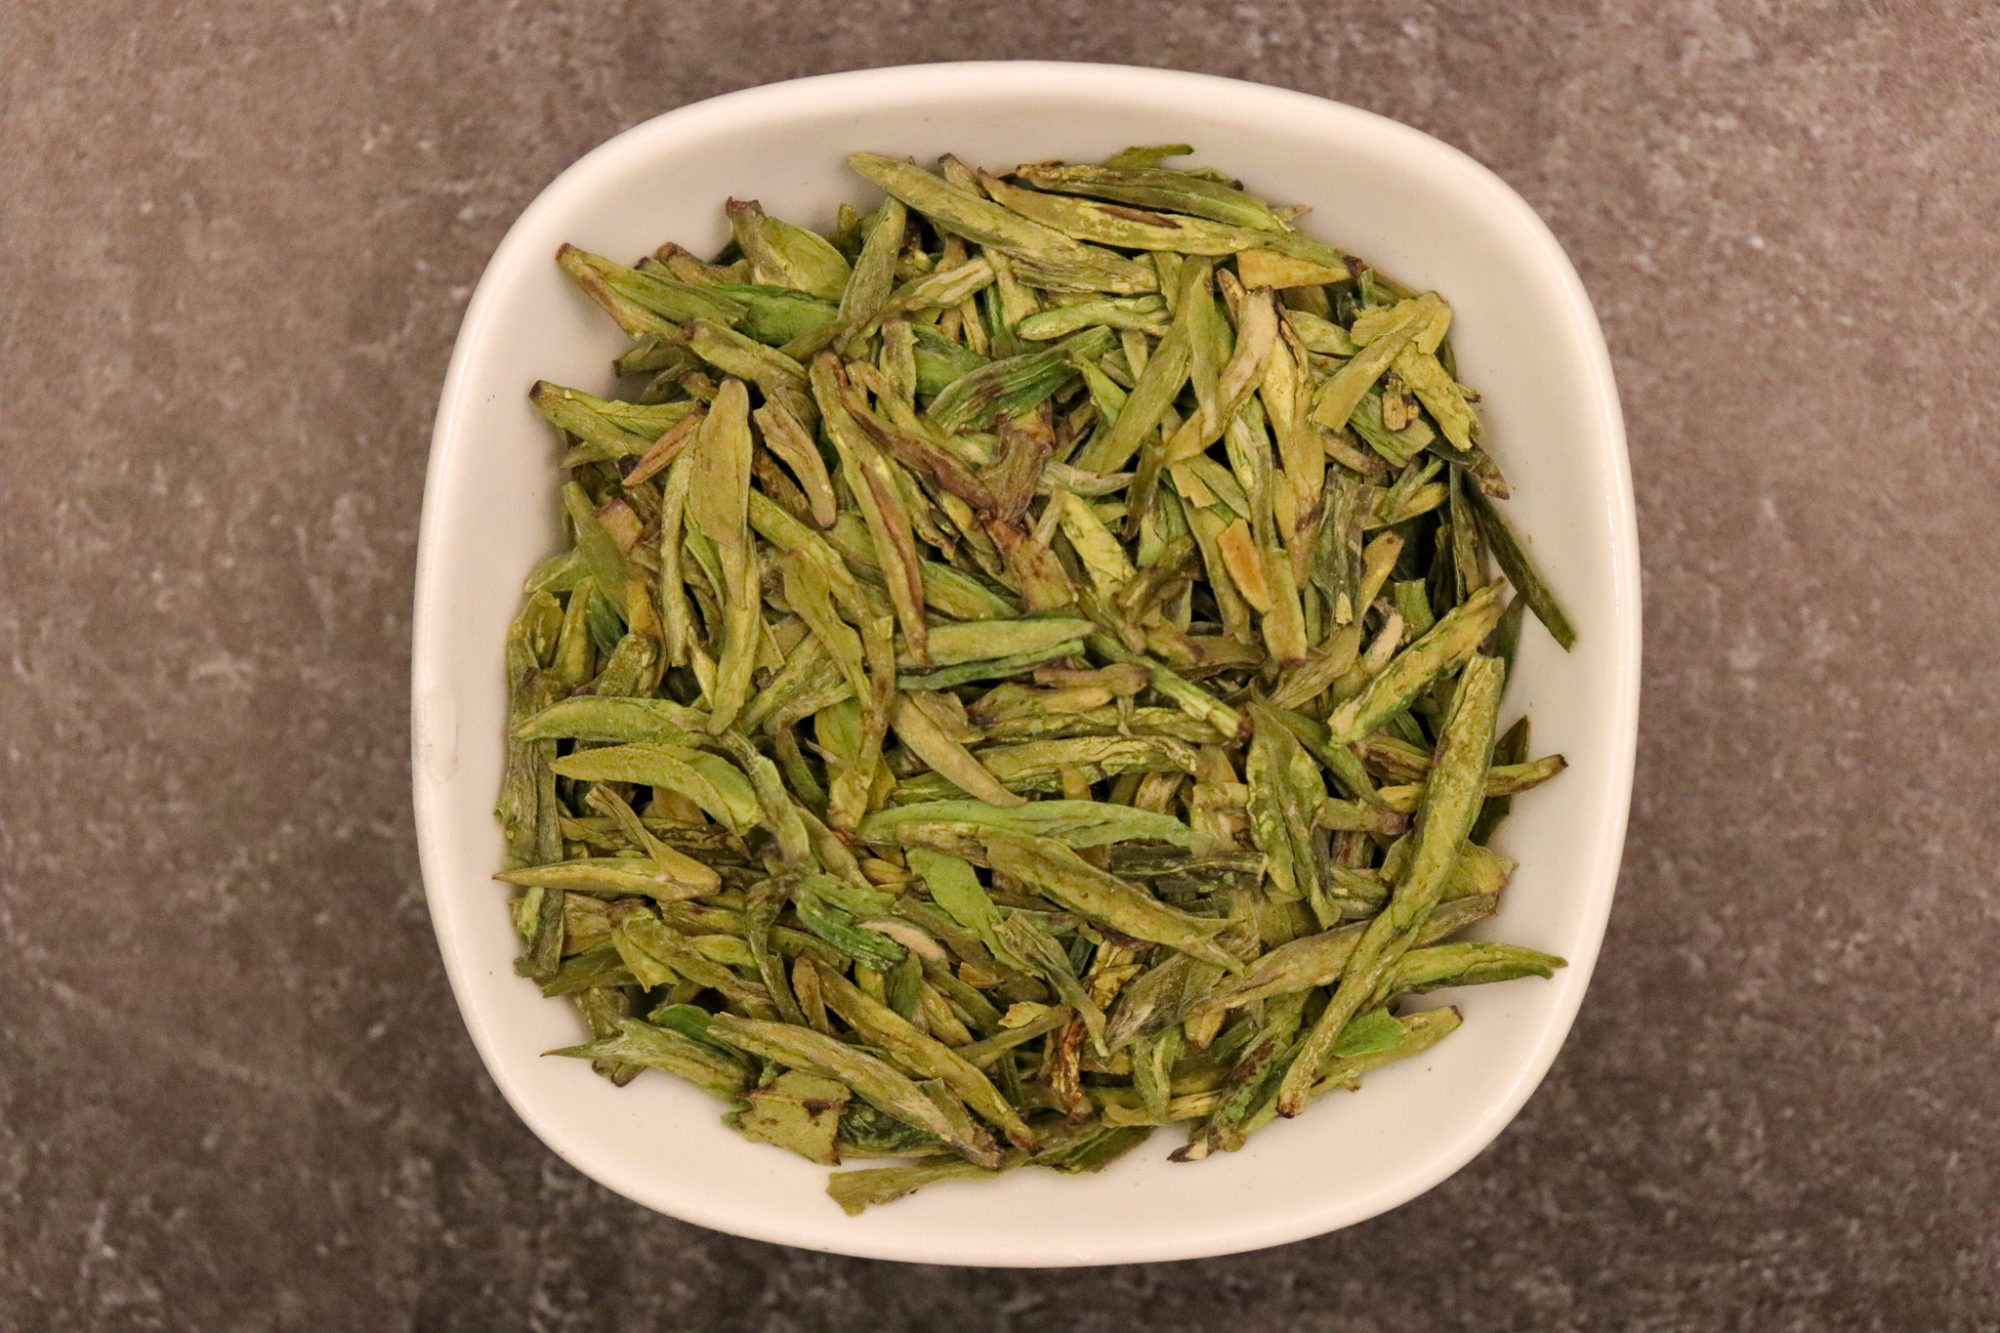 Teavivre Organic Nonpareil Ming Qian Dragon Well Long Jing Green Tea 2021